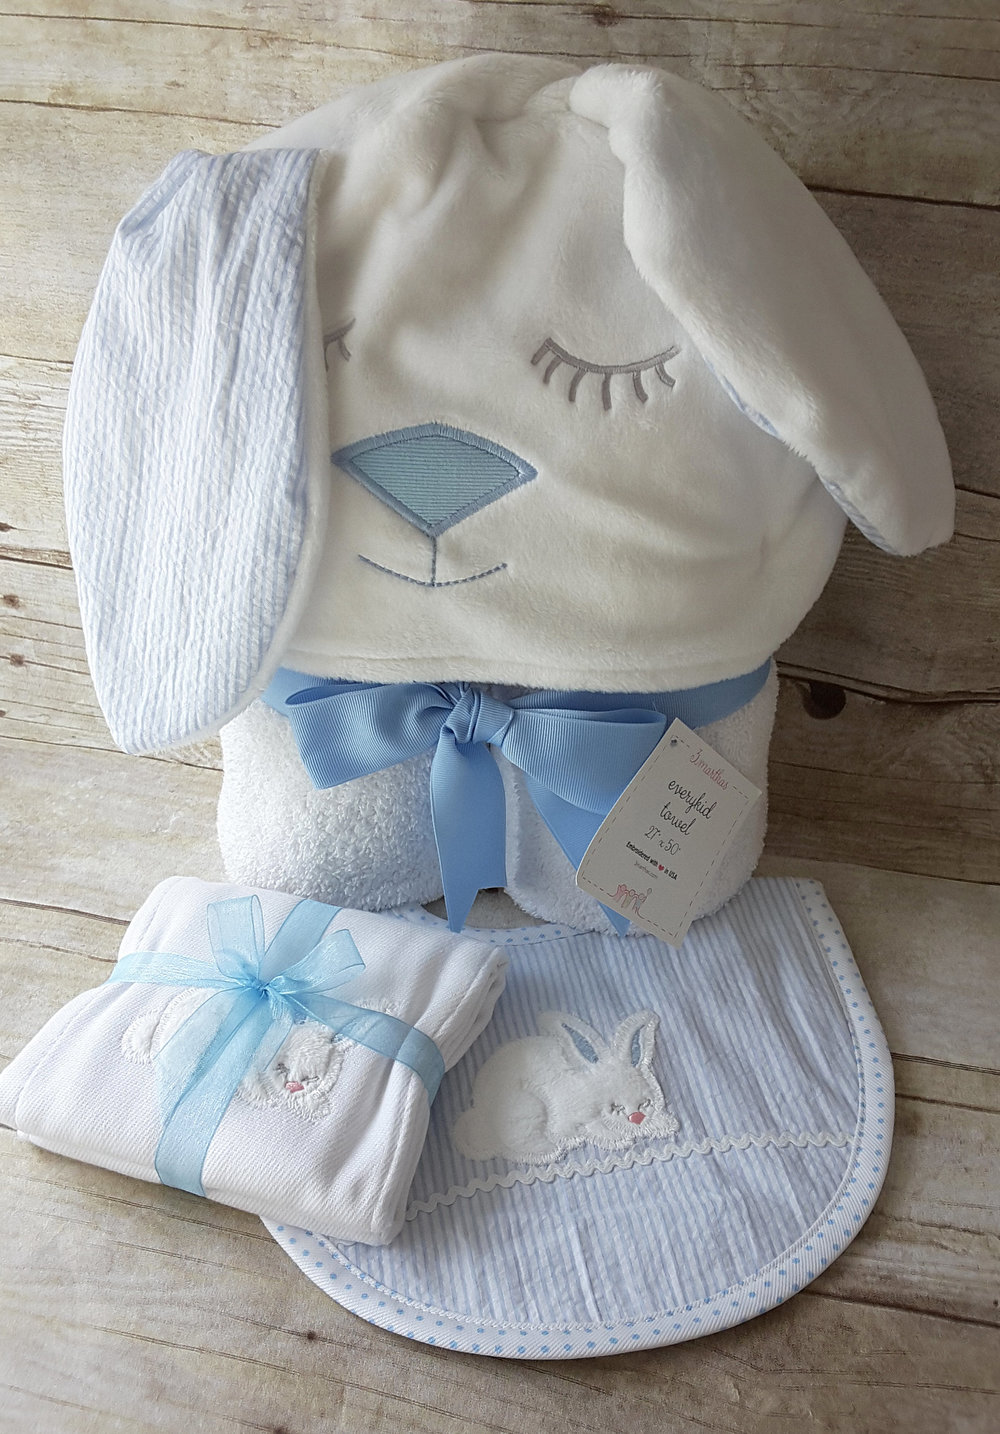 Blue Bunny Character Towel, Blue Bunny Burp Cloth, and Blue Bunny Medium Bib